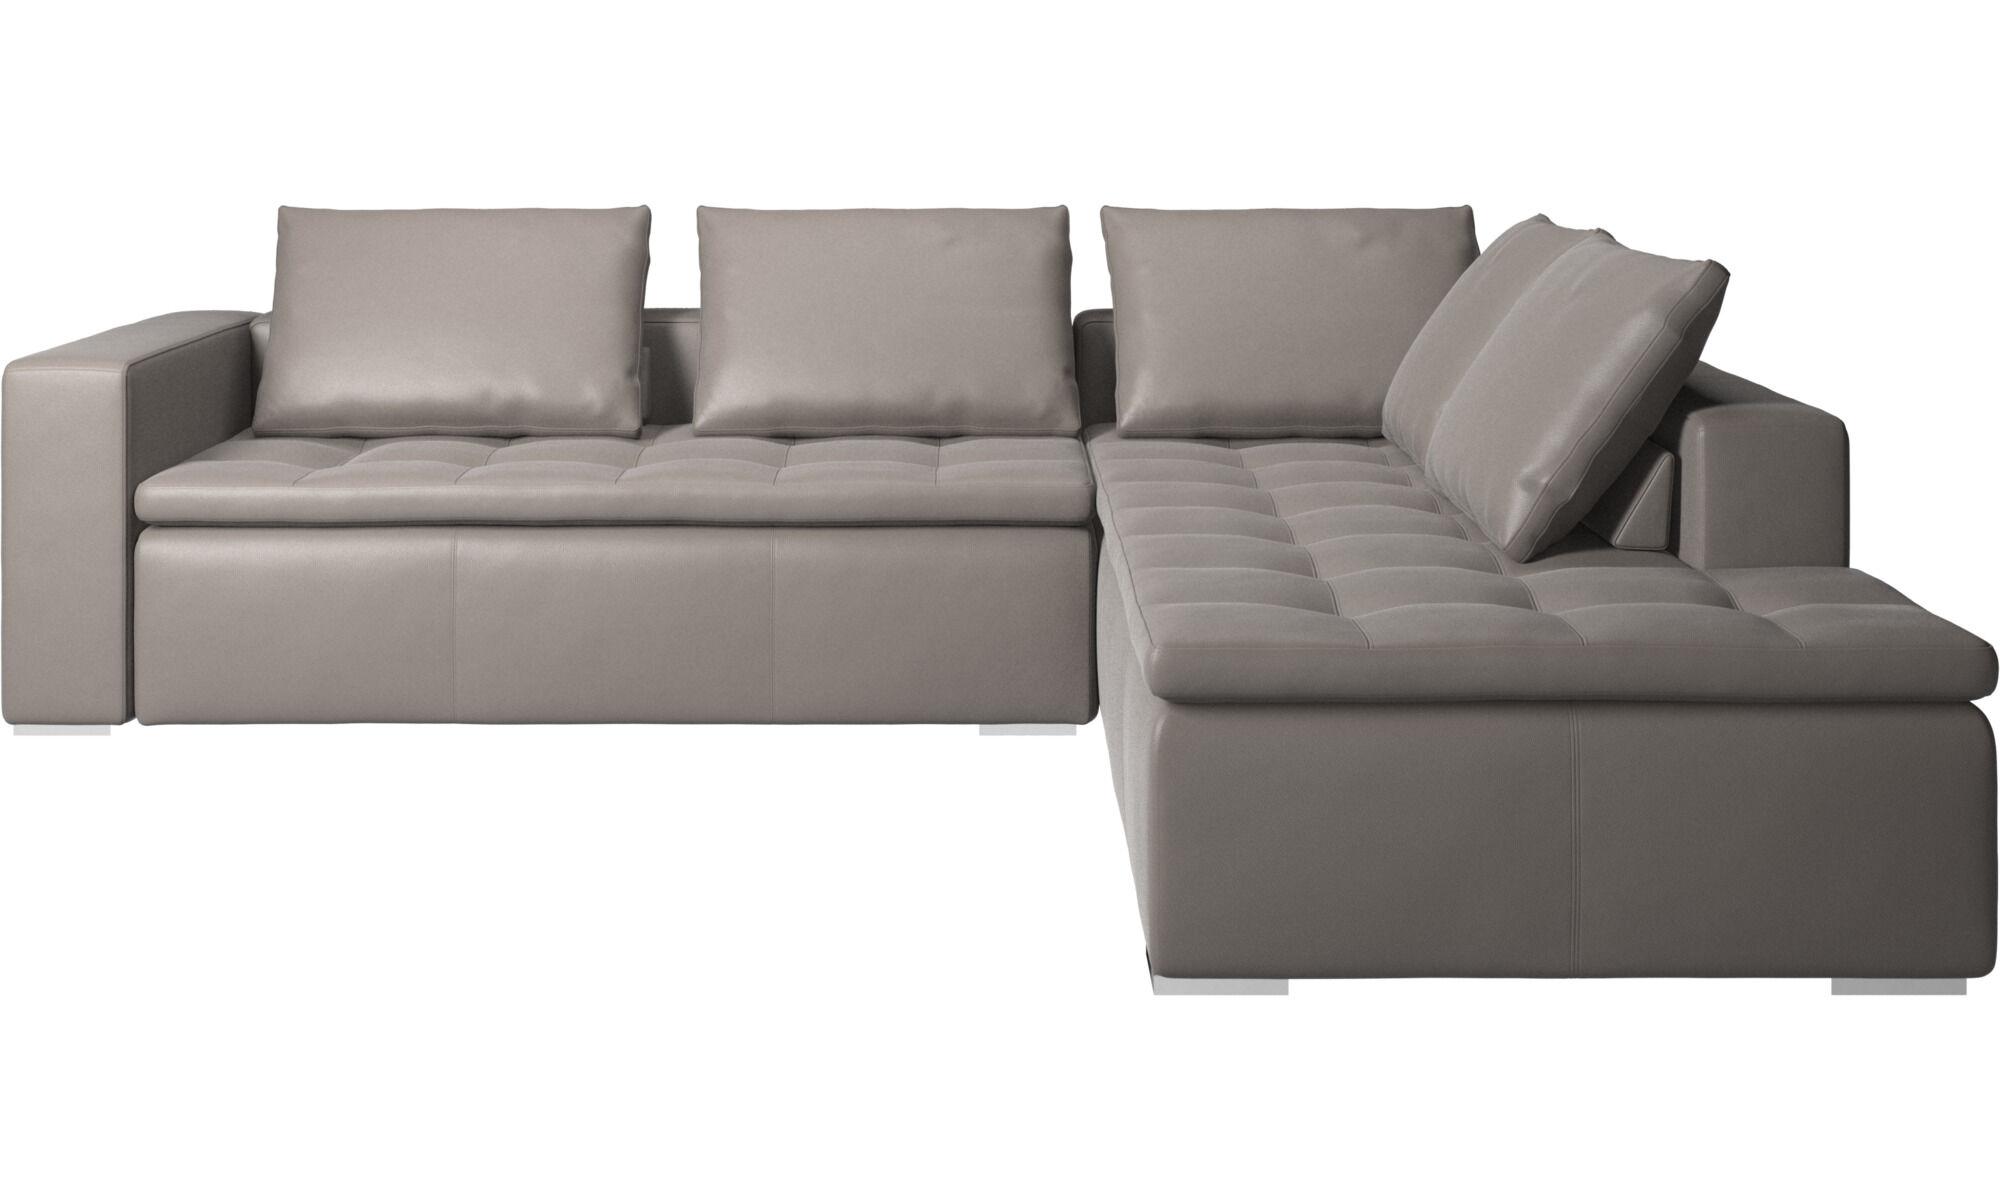 Mezzo corner sofa - 25% OFF